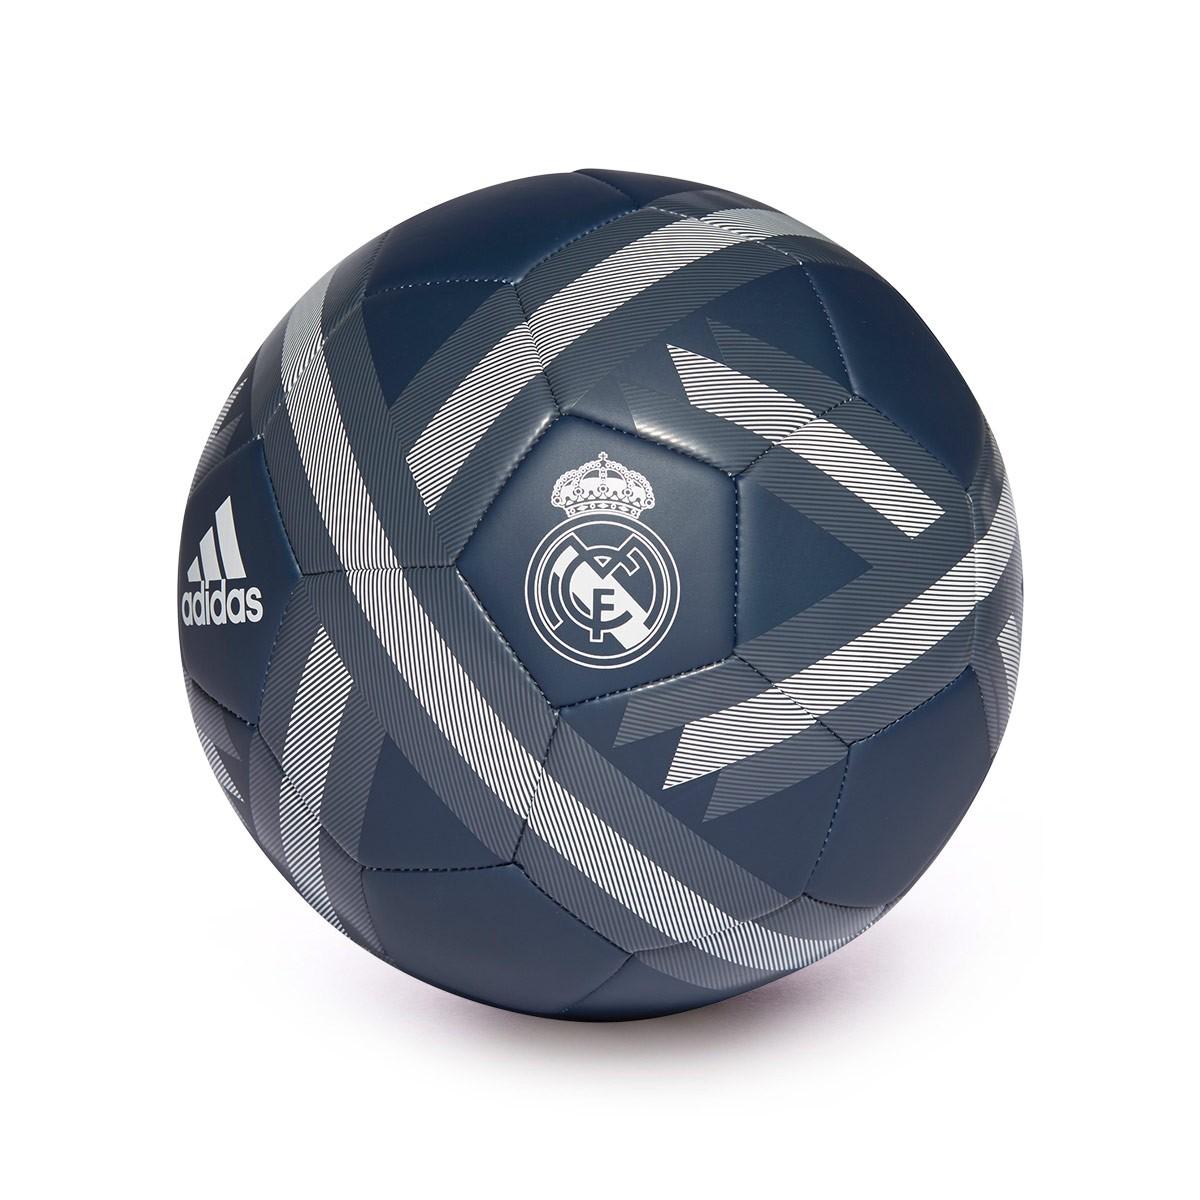 1e1965d08699b Balón adidas Real Madrid 2018-2019 Tech-onix-Bold onix-White - Tienda de fútbol  Fútbol Emotion